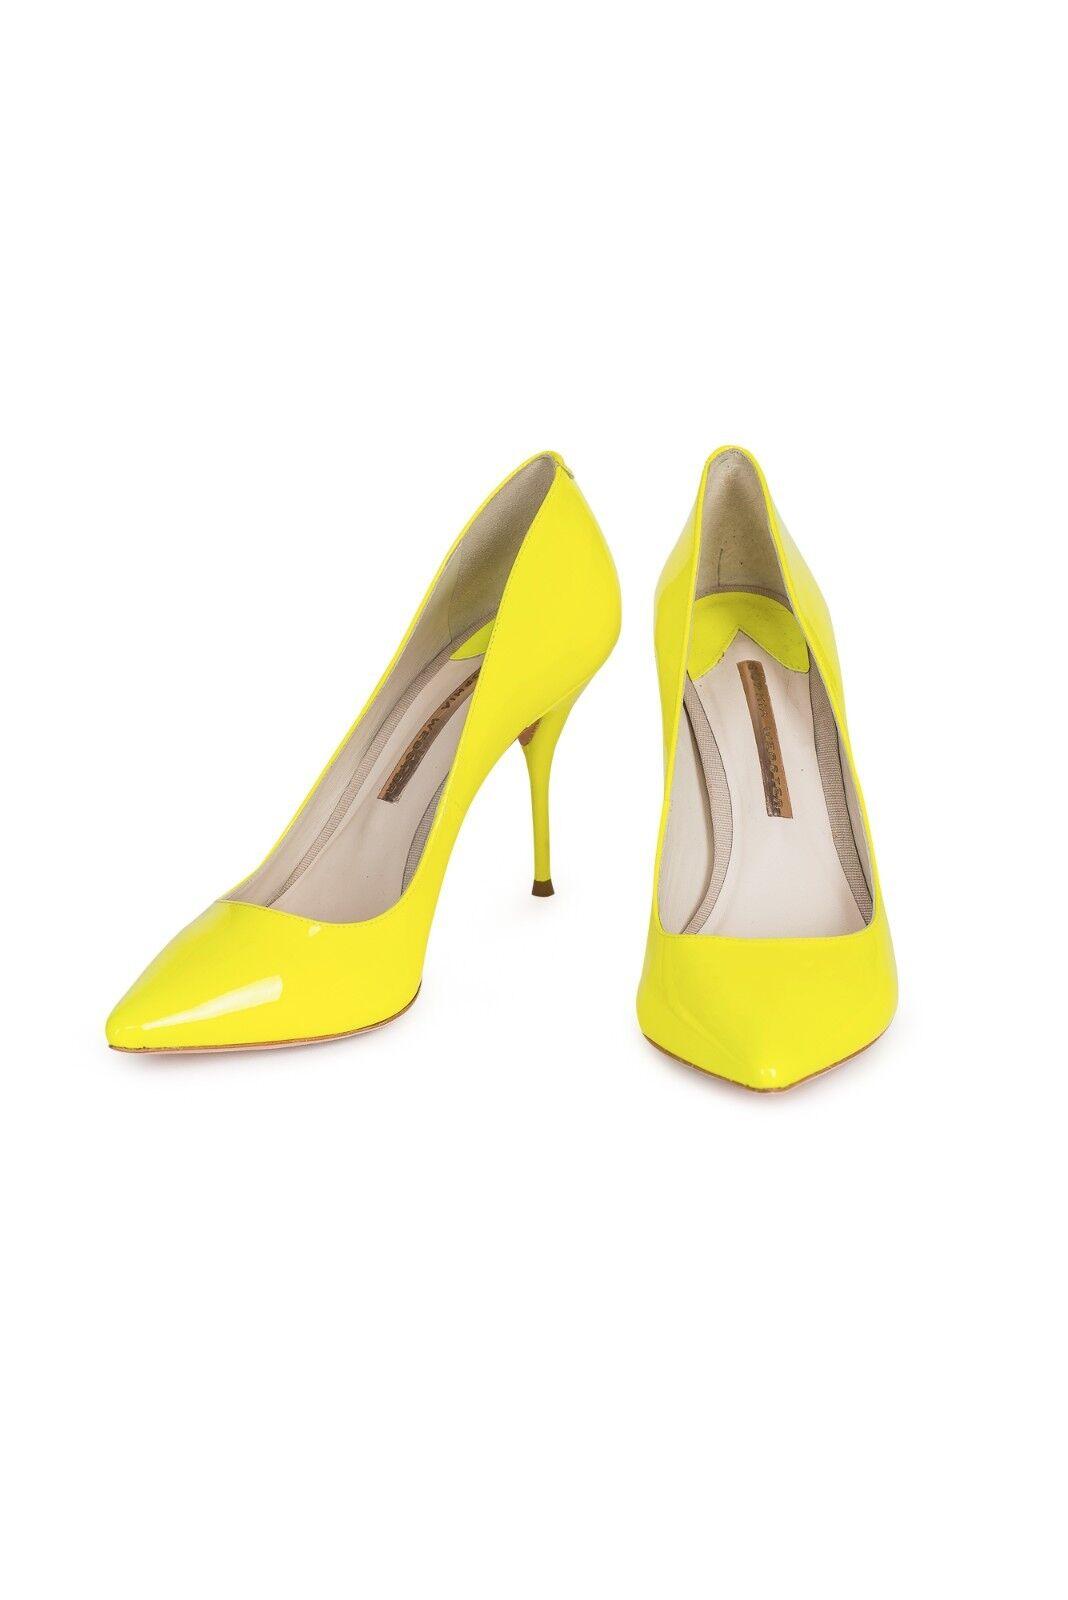 Sophia Webster Lola Neon jaune Pumps, New